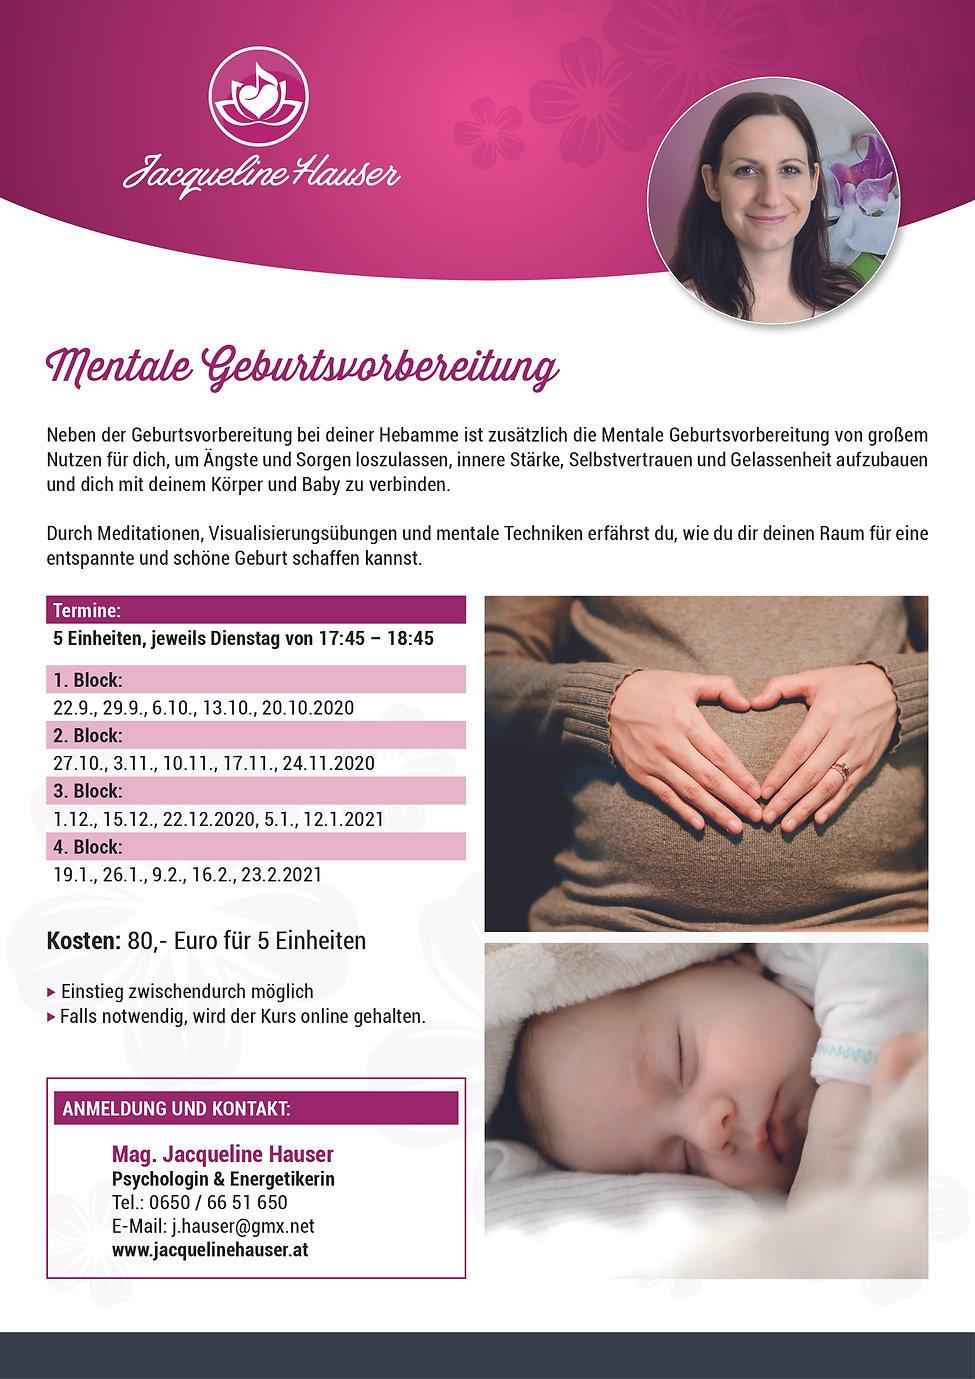 Mentale_Geburtsvorbereitung A4.jpg